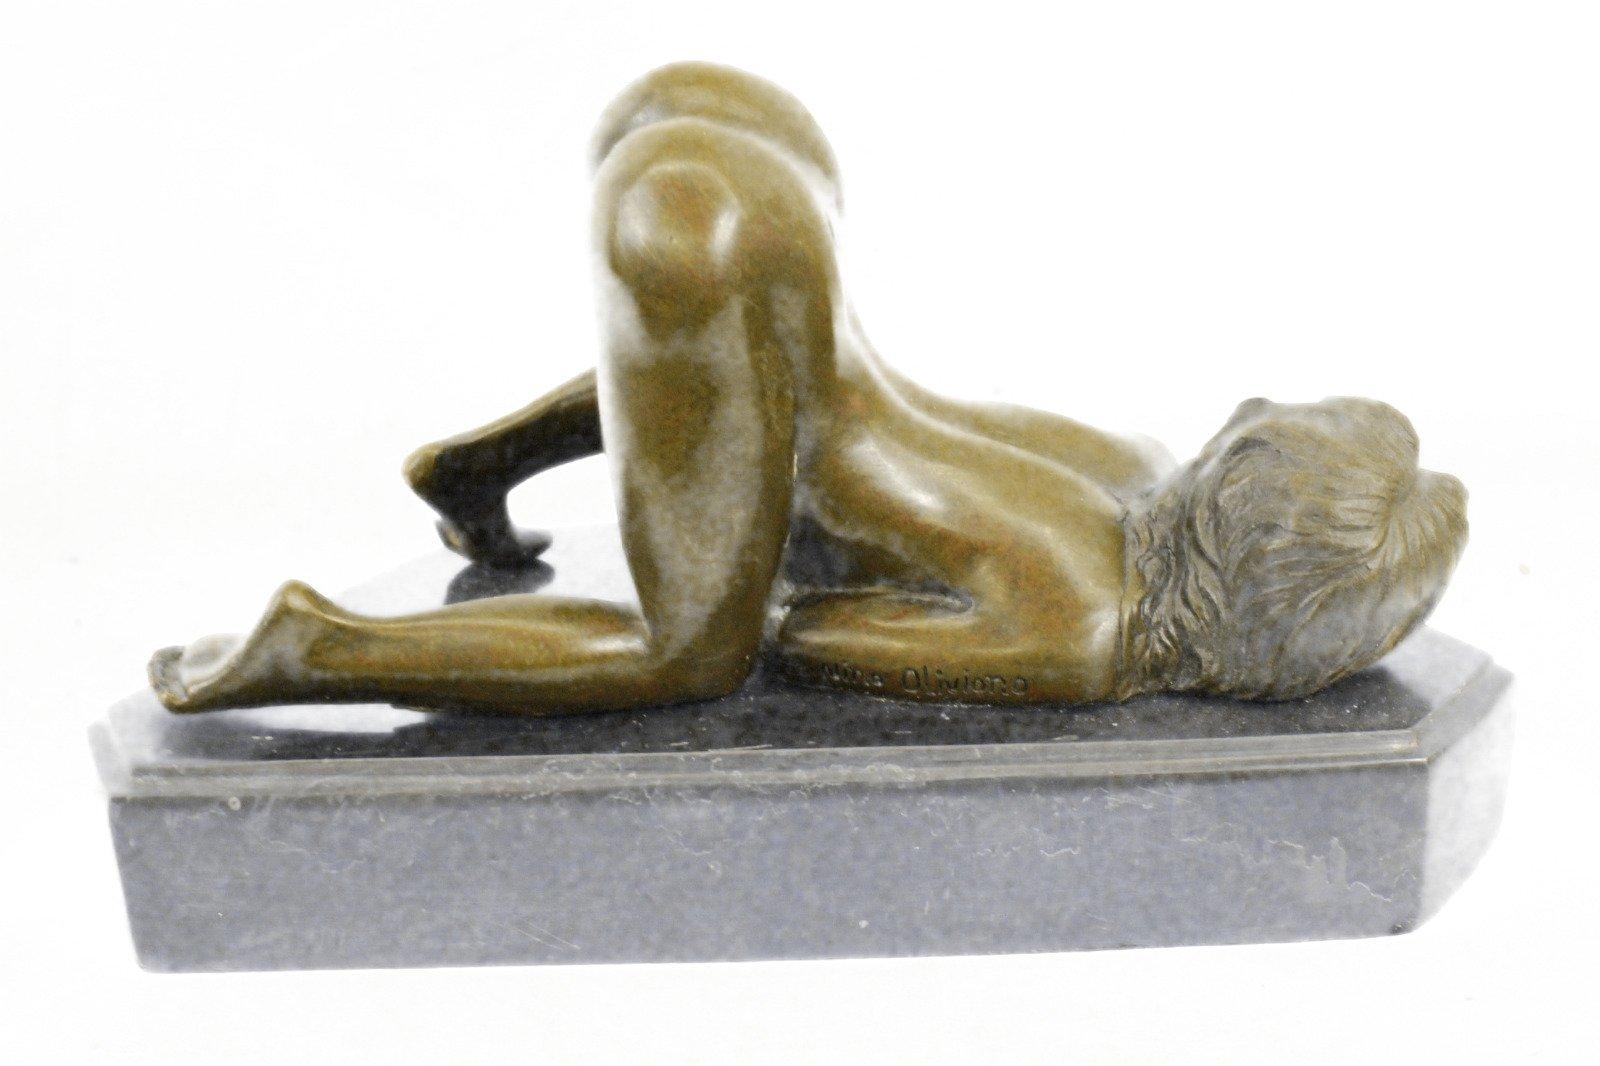 Amazon.com: Handmade European Bronze Sculpture Original